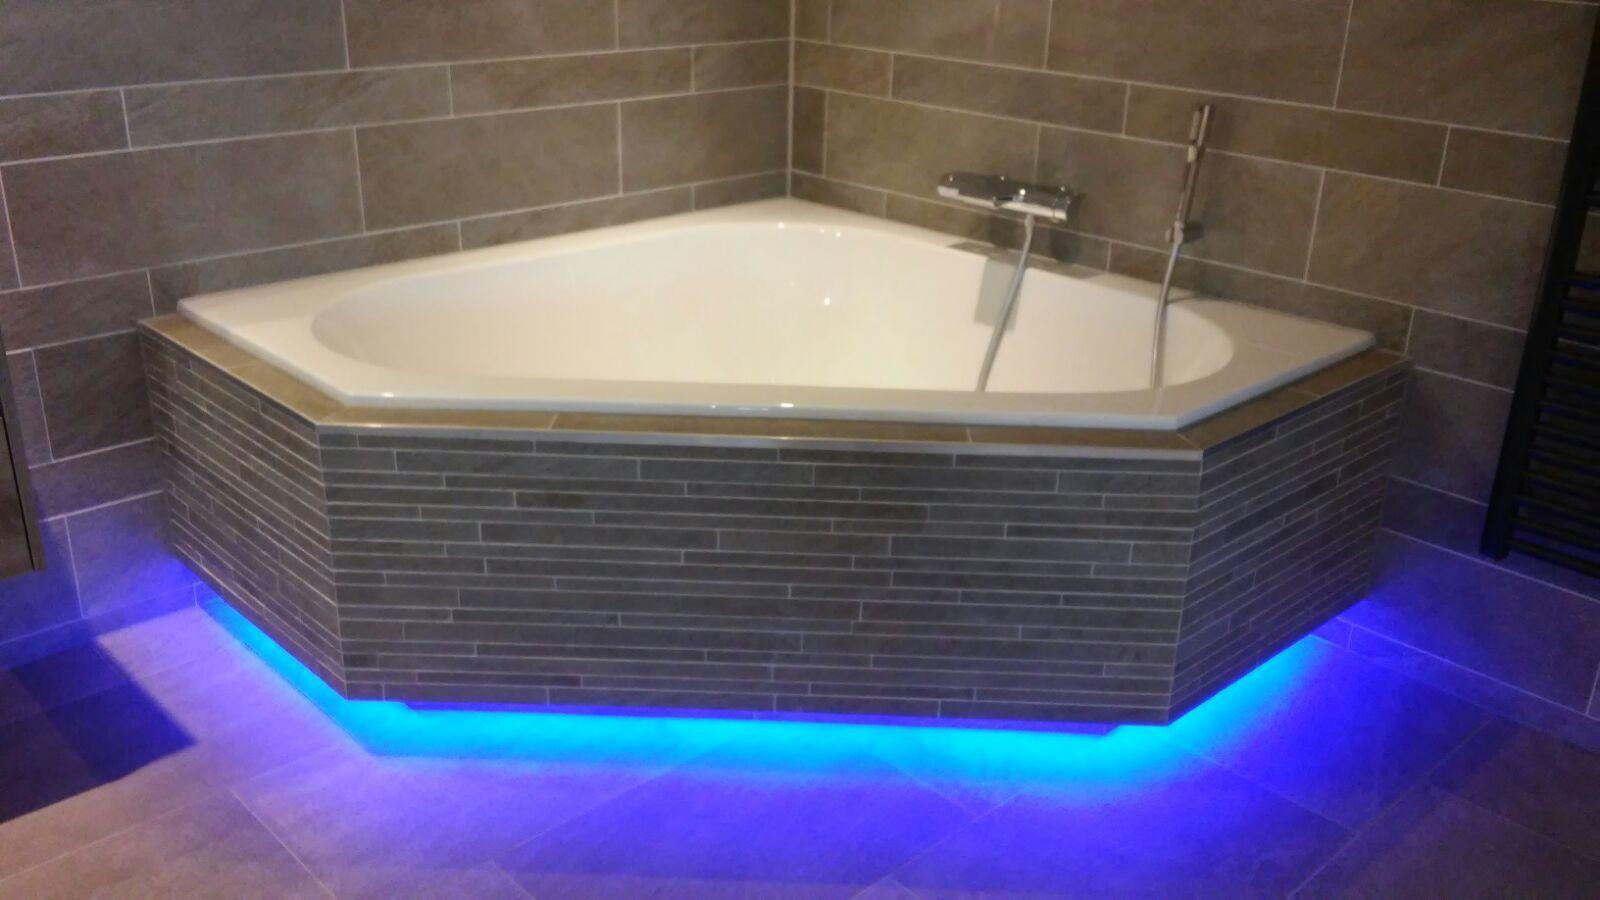 Led Streifen Wasserfest Machen Led Gigant De Led Streifen Led Badezimmer Innenausstattung